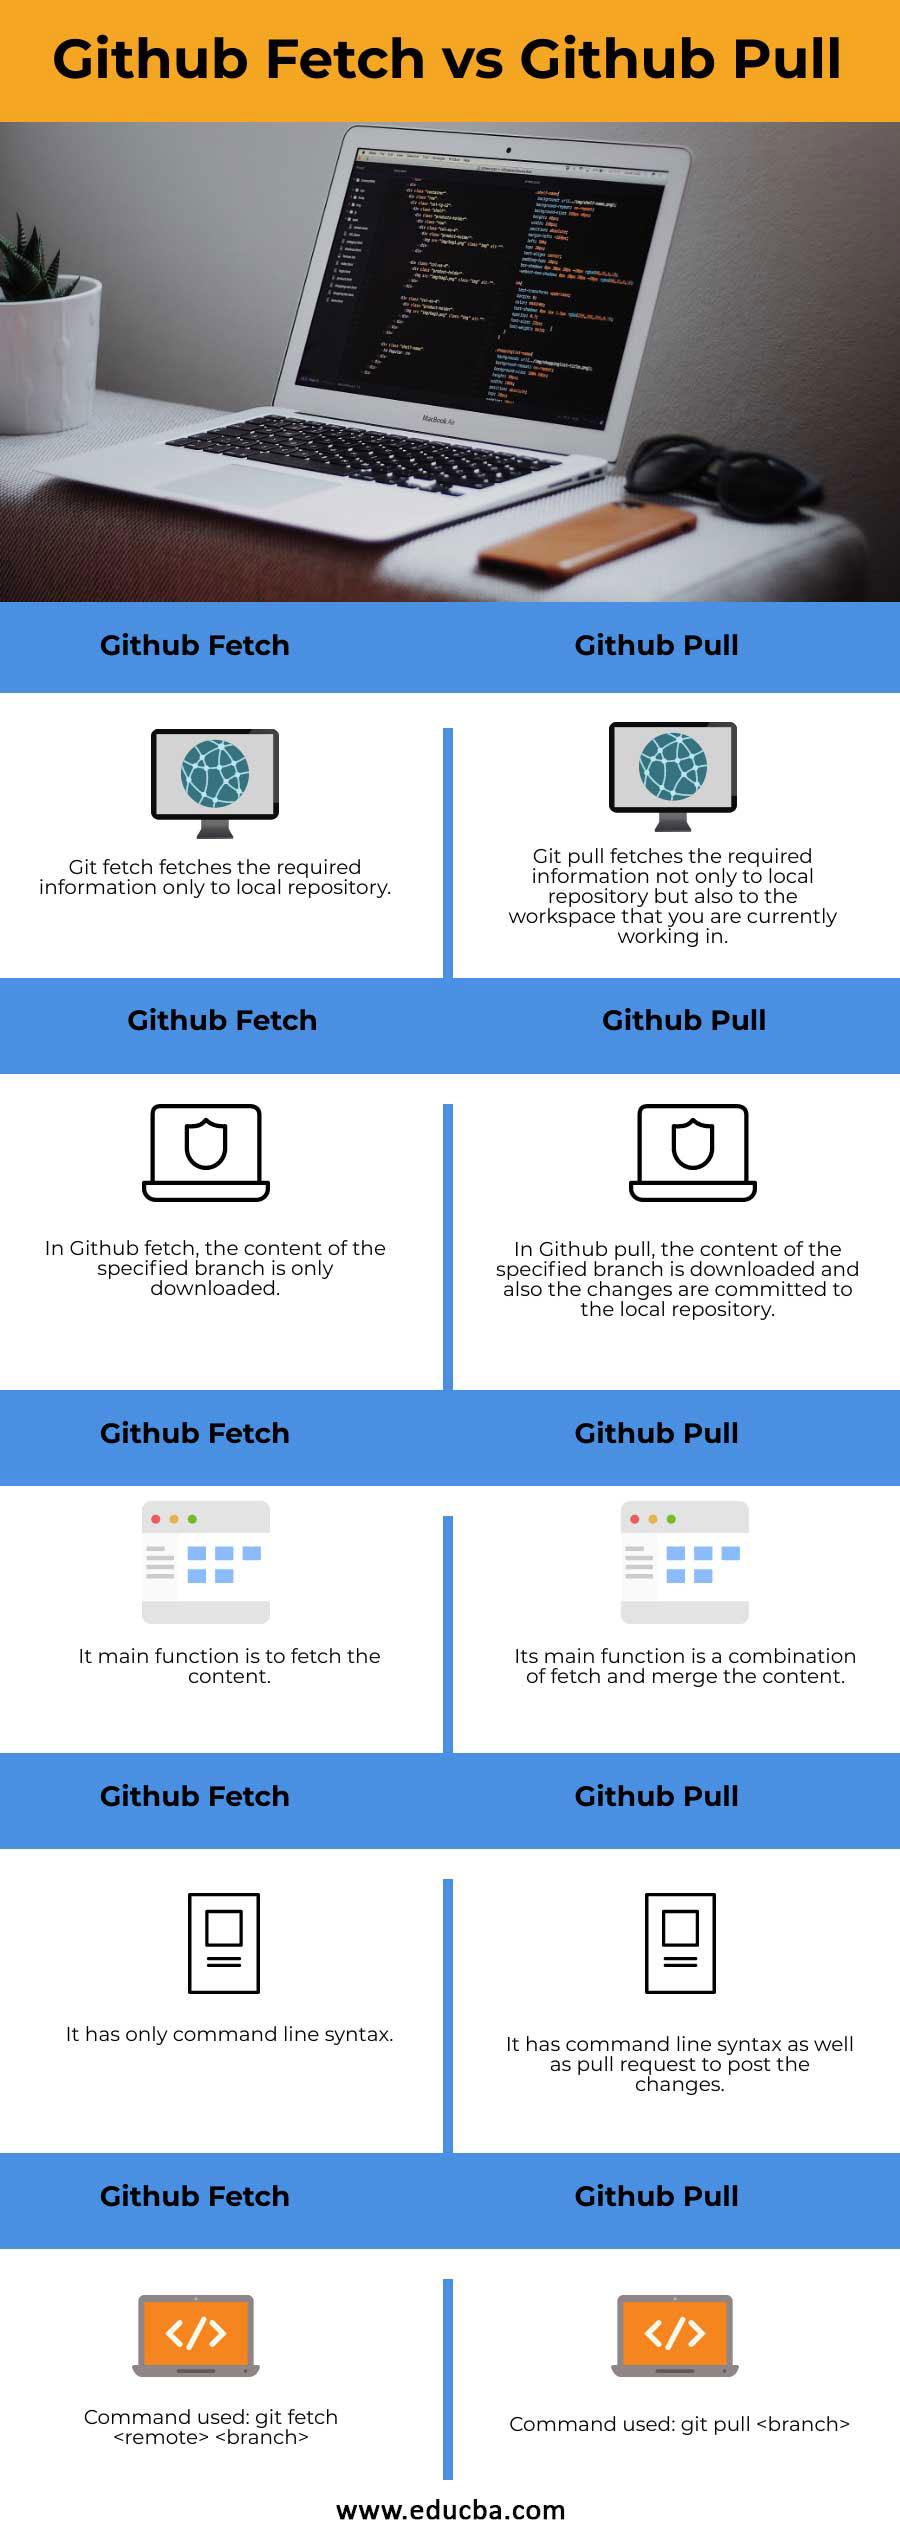 Github-Fetch-vs-Github-Pull-info